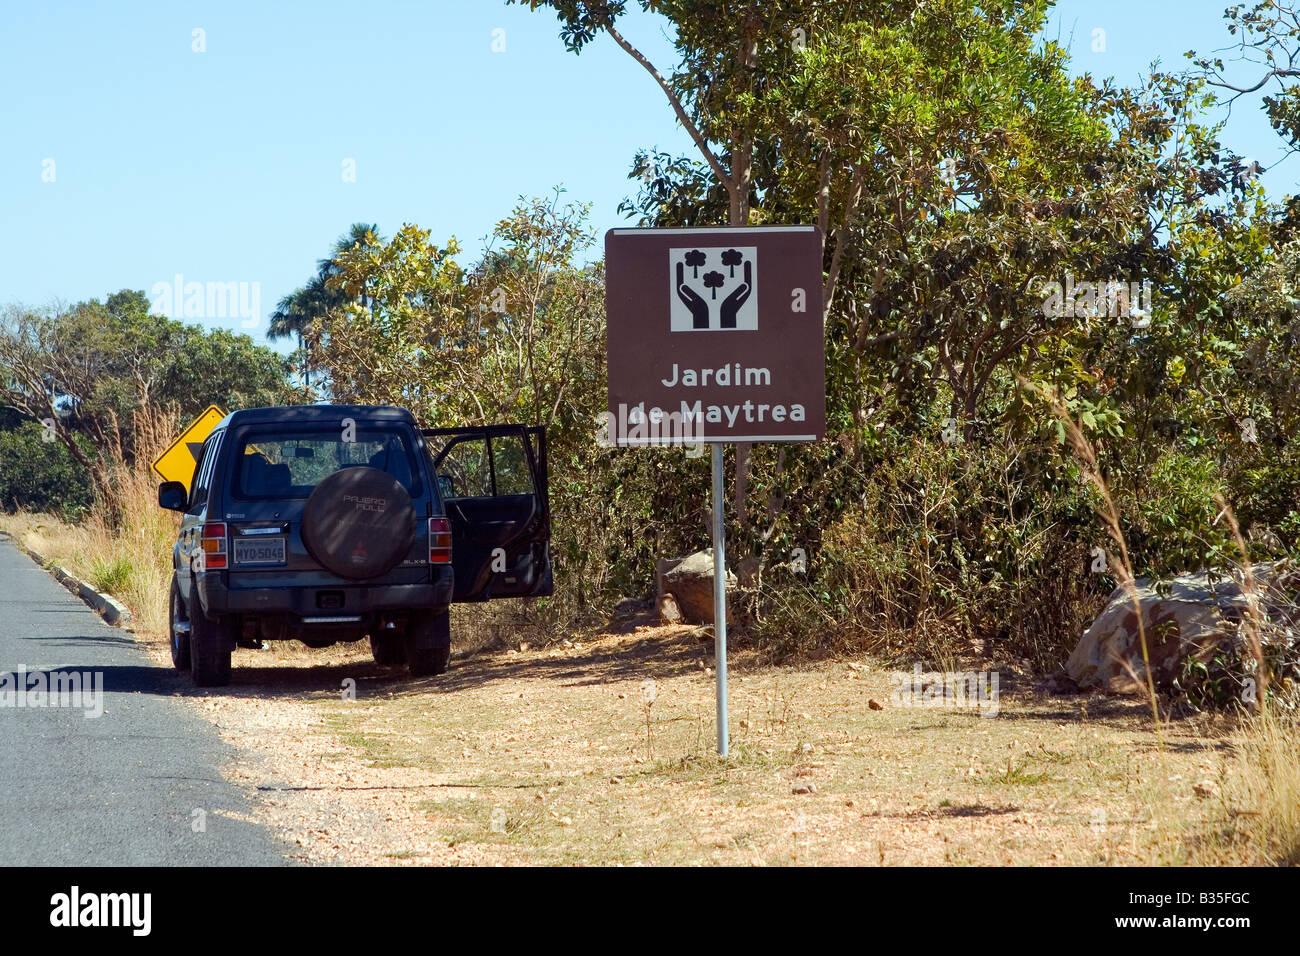 Maytreas Garden Stop, View Point, Chapada dos Veadeiros, Veadeiros Tableland, Goias, Brazil Stock Photo